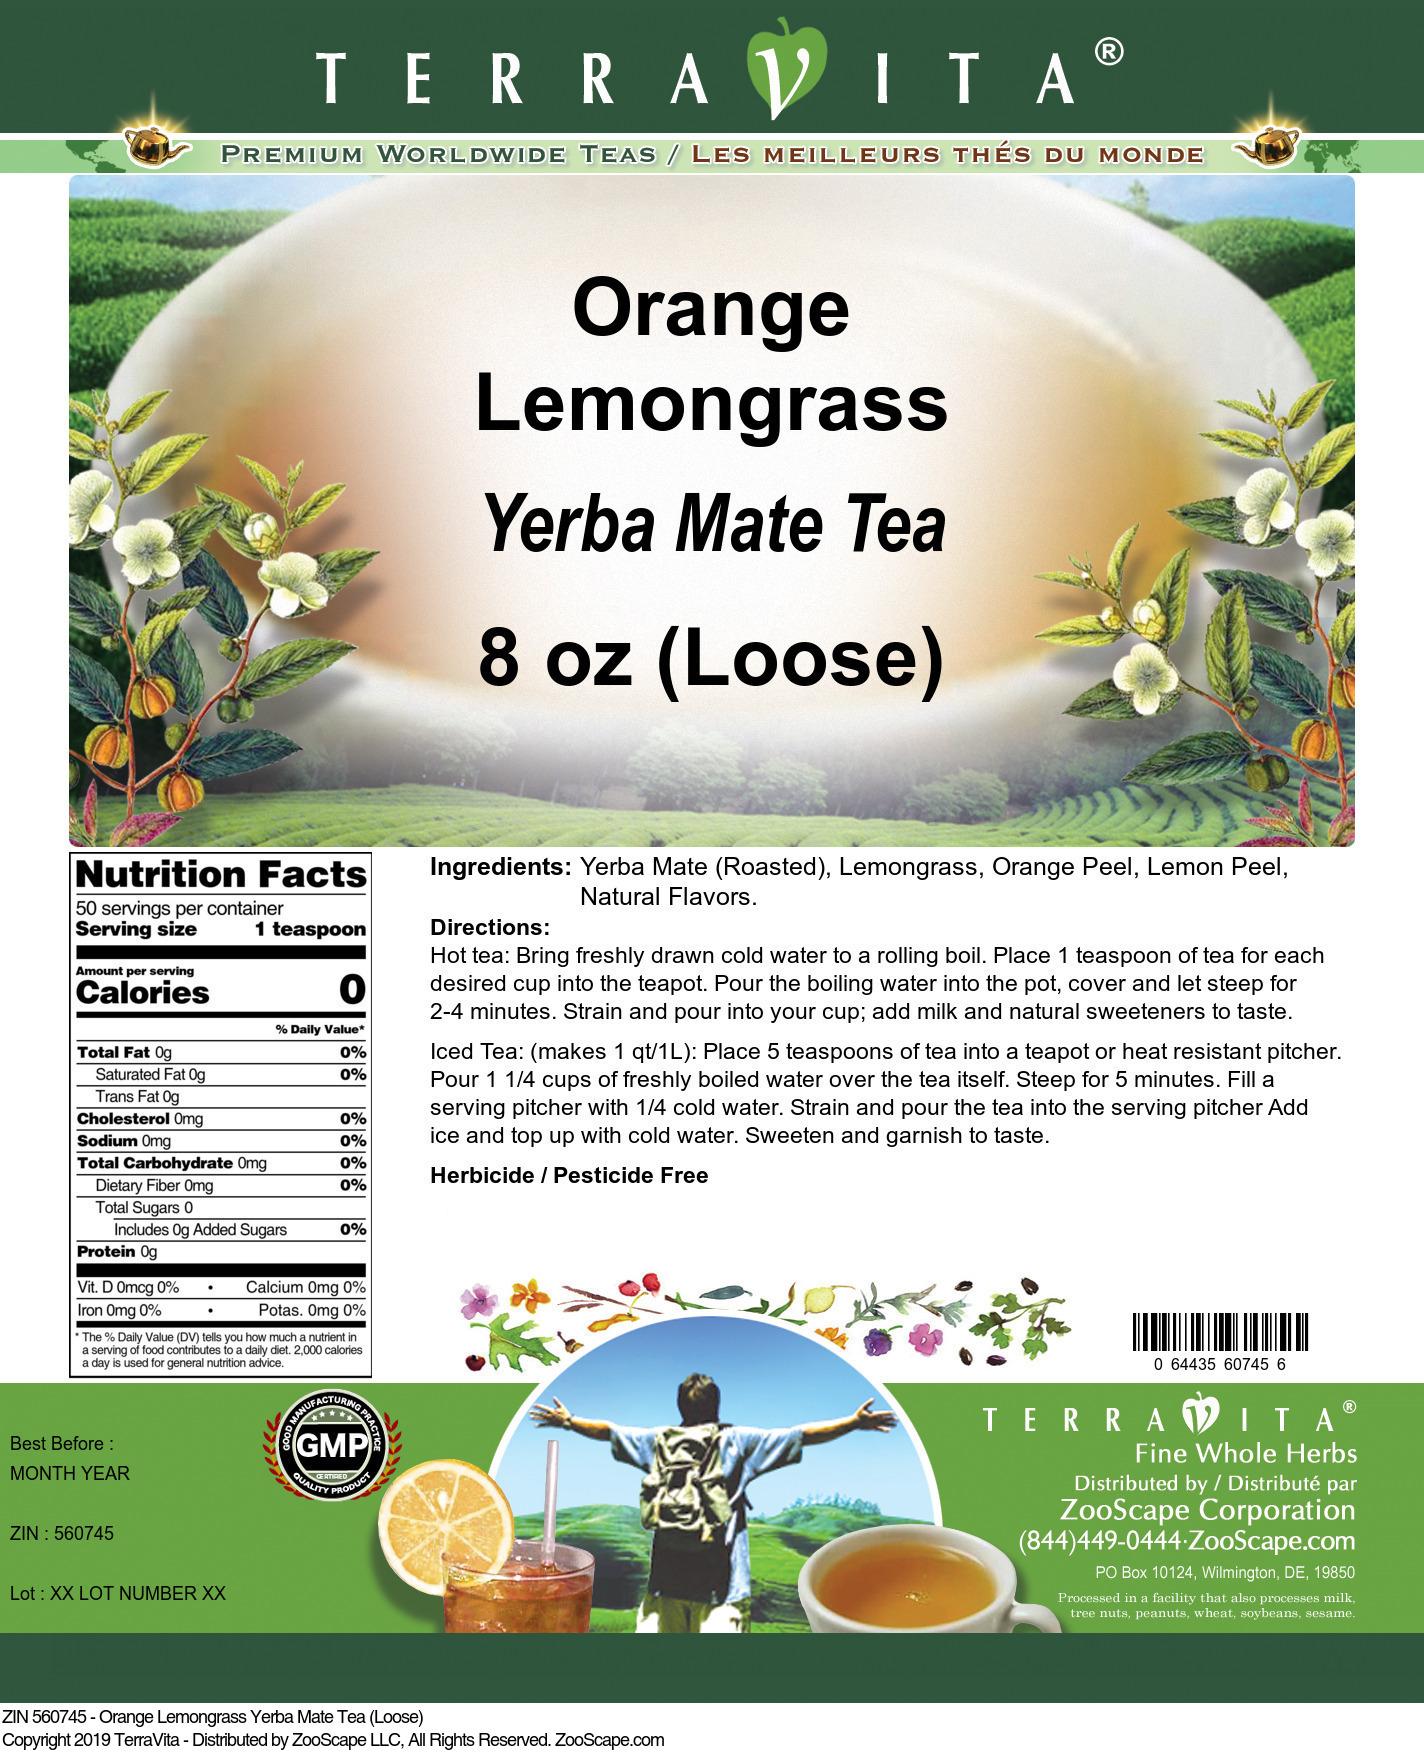 Orange Lemongrass Yerba Mate Tea (Loose)